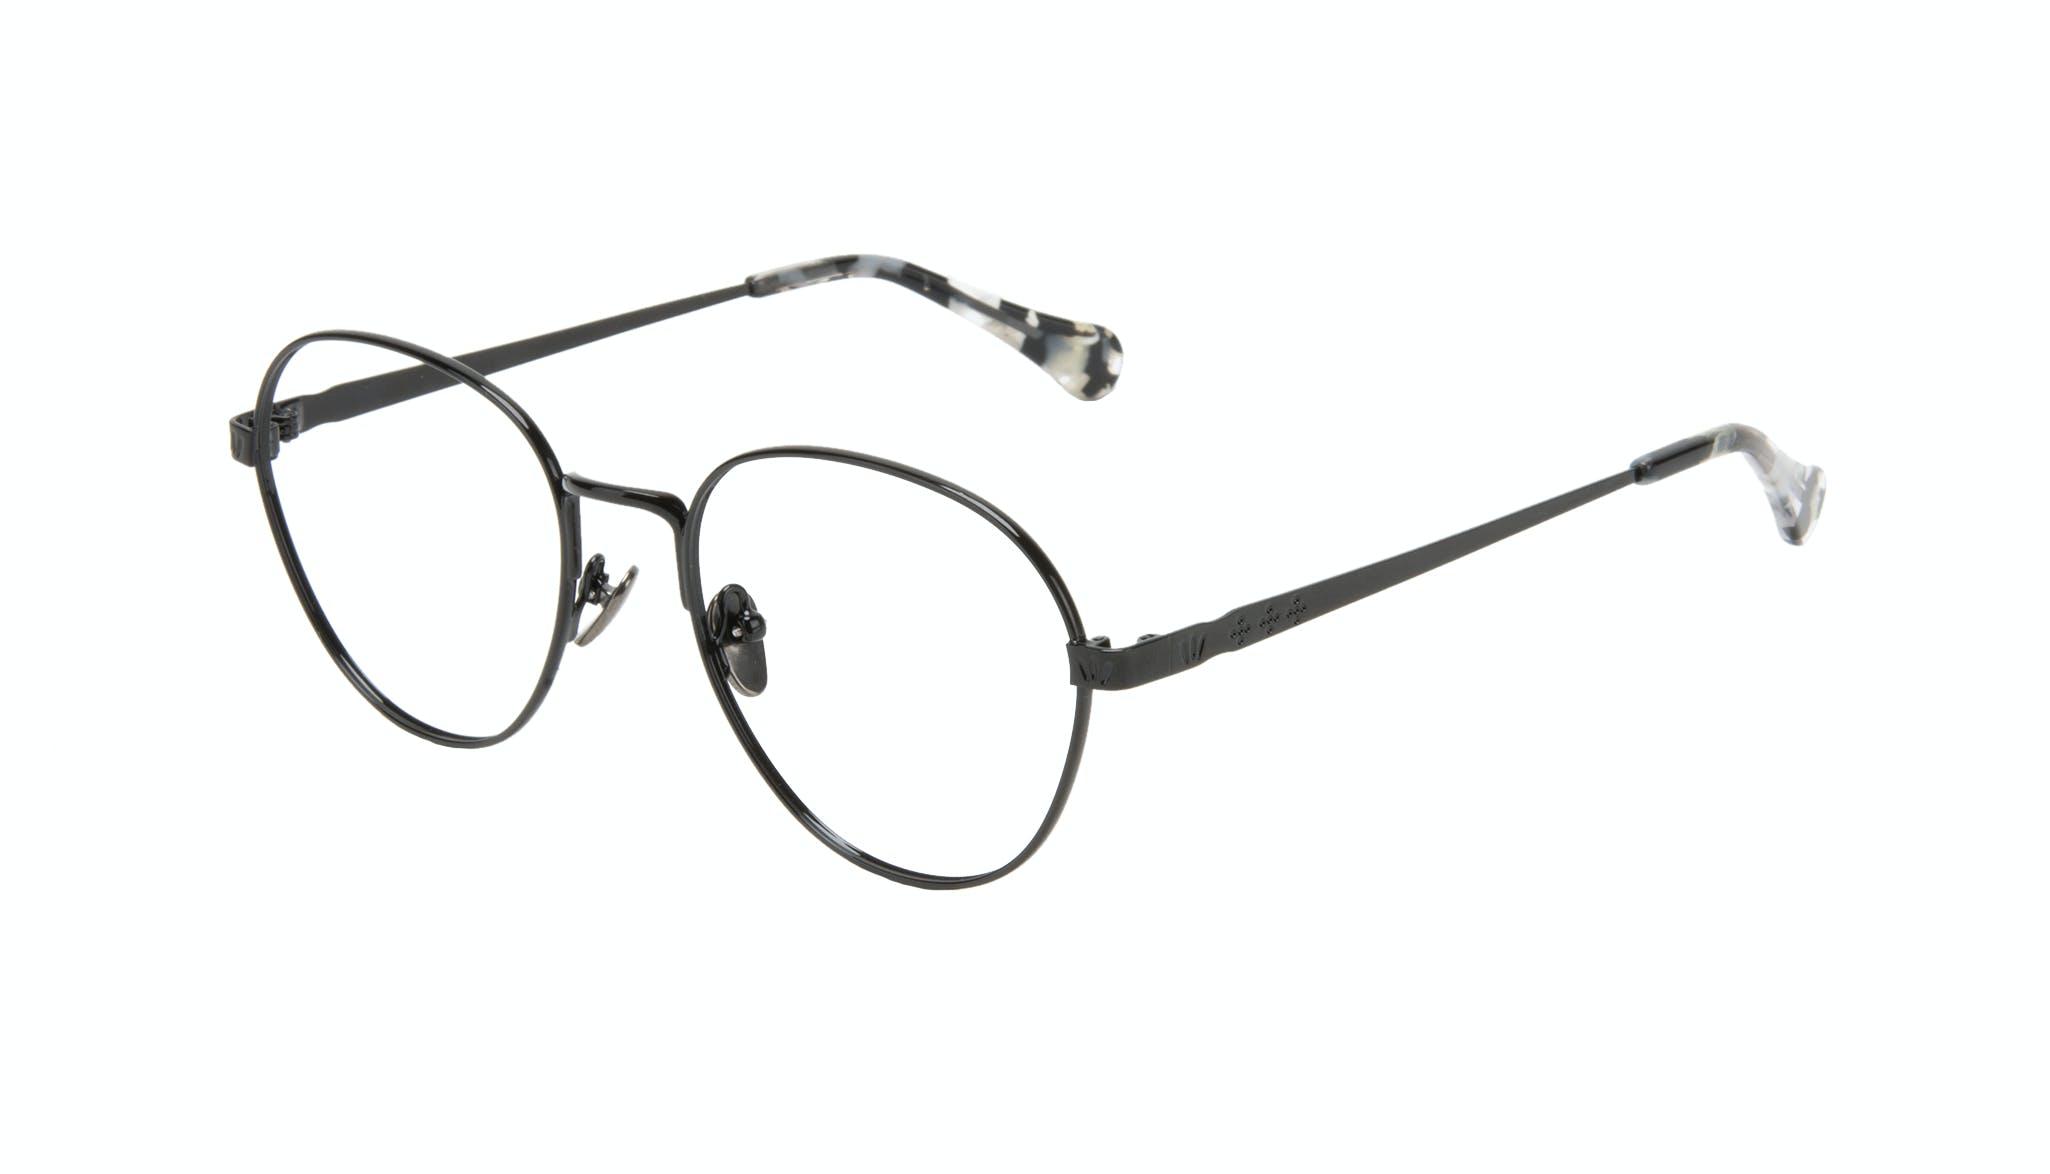 Affordable Fashion Glasses Round Eyeglasses Women Brace Onyx Marble Tilt